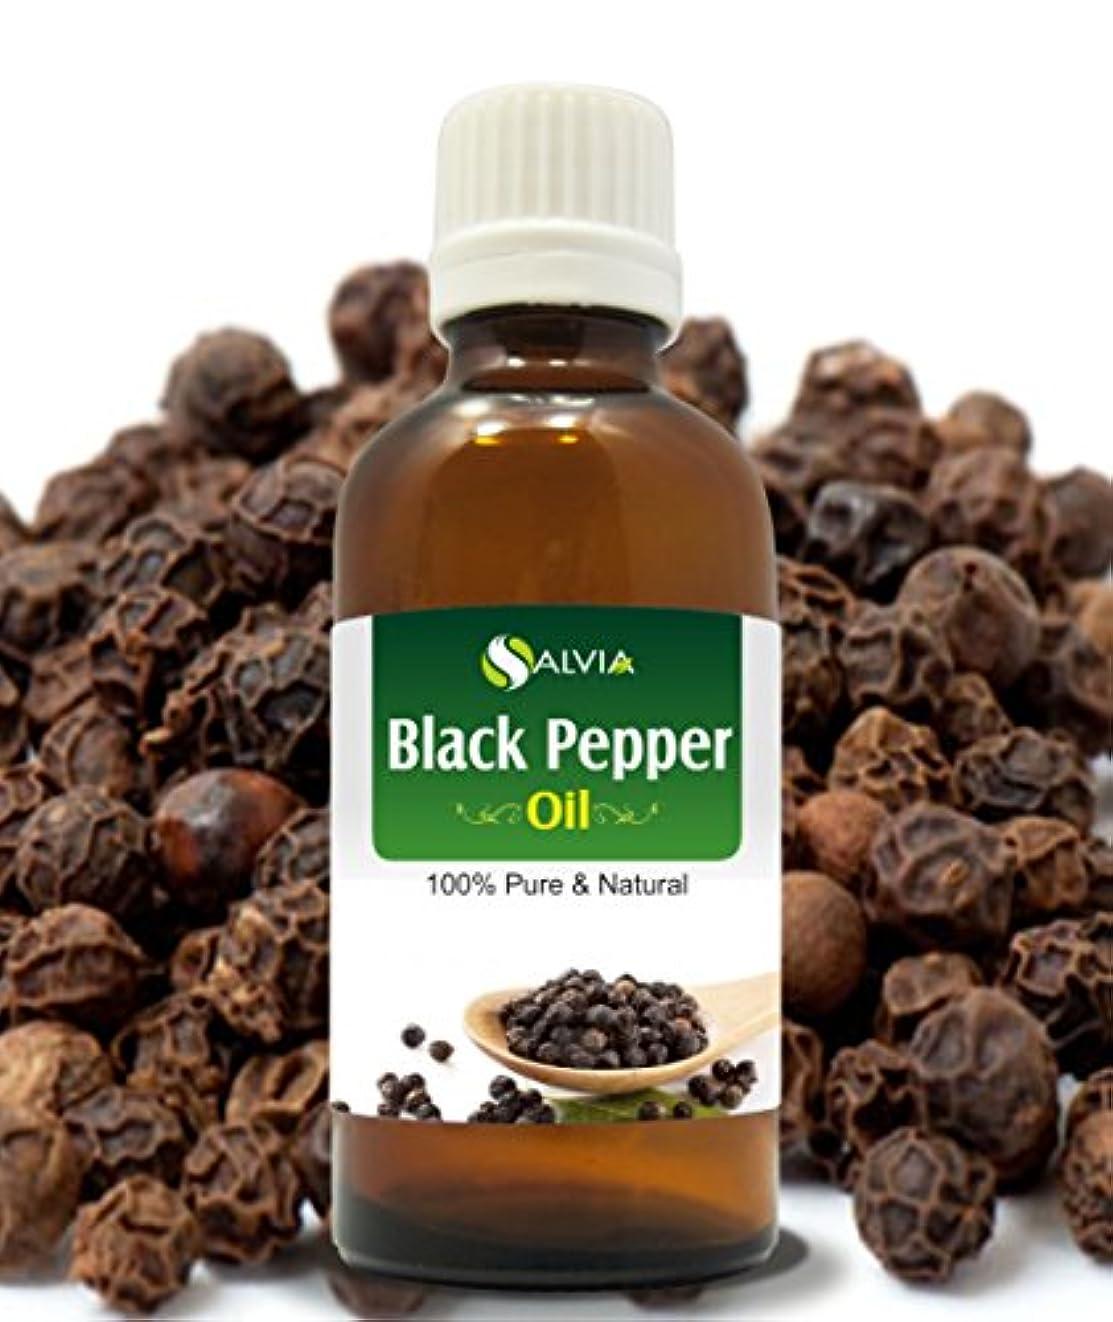 革命的合計郡BLACK PEPPER OIL 100% NATURAL PURE UNDILUTED UNCUT ESSENTIAL OIL 50ML